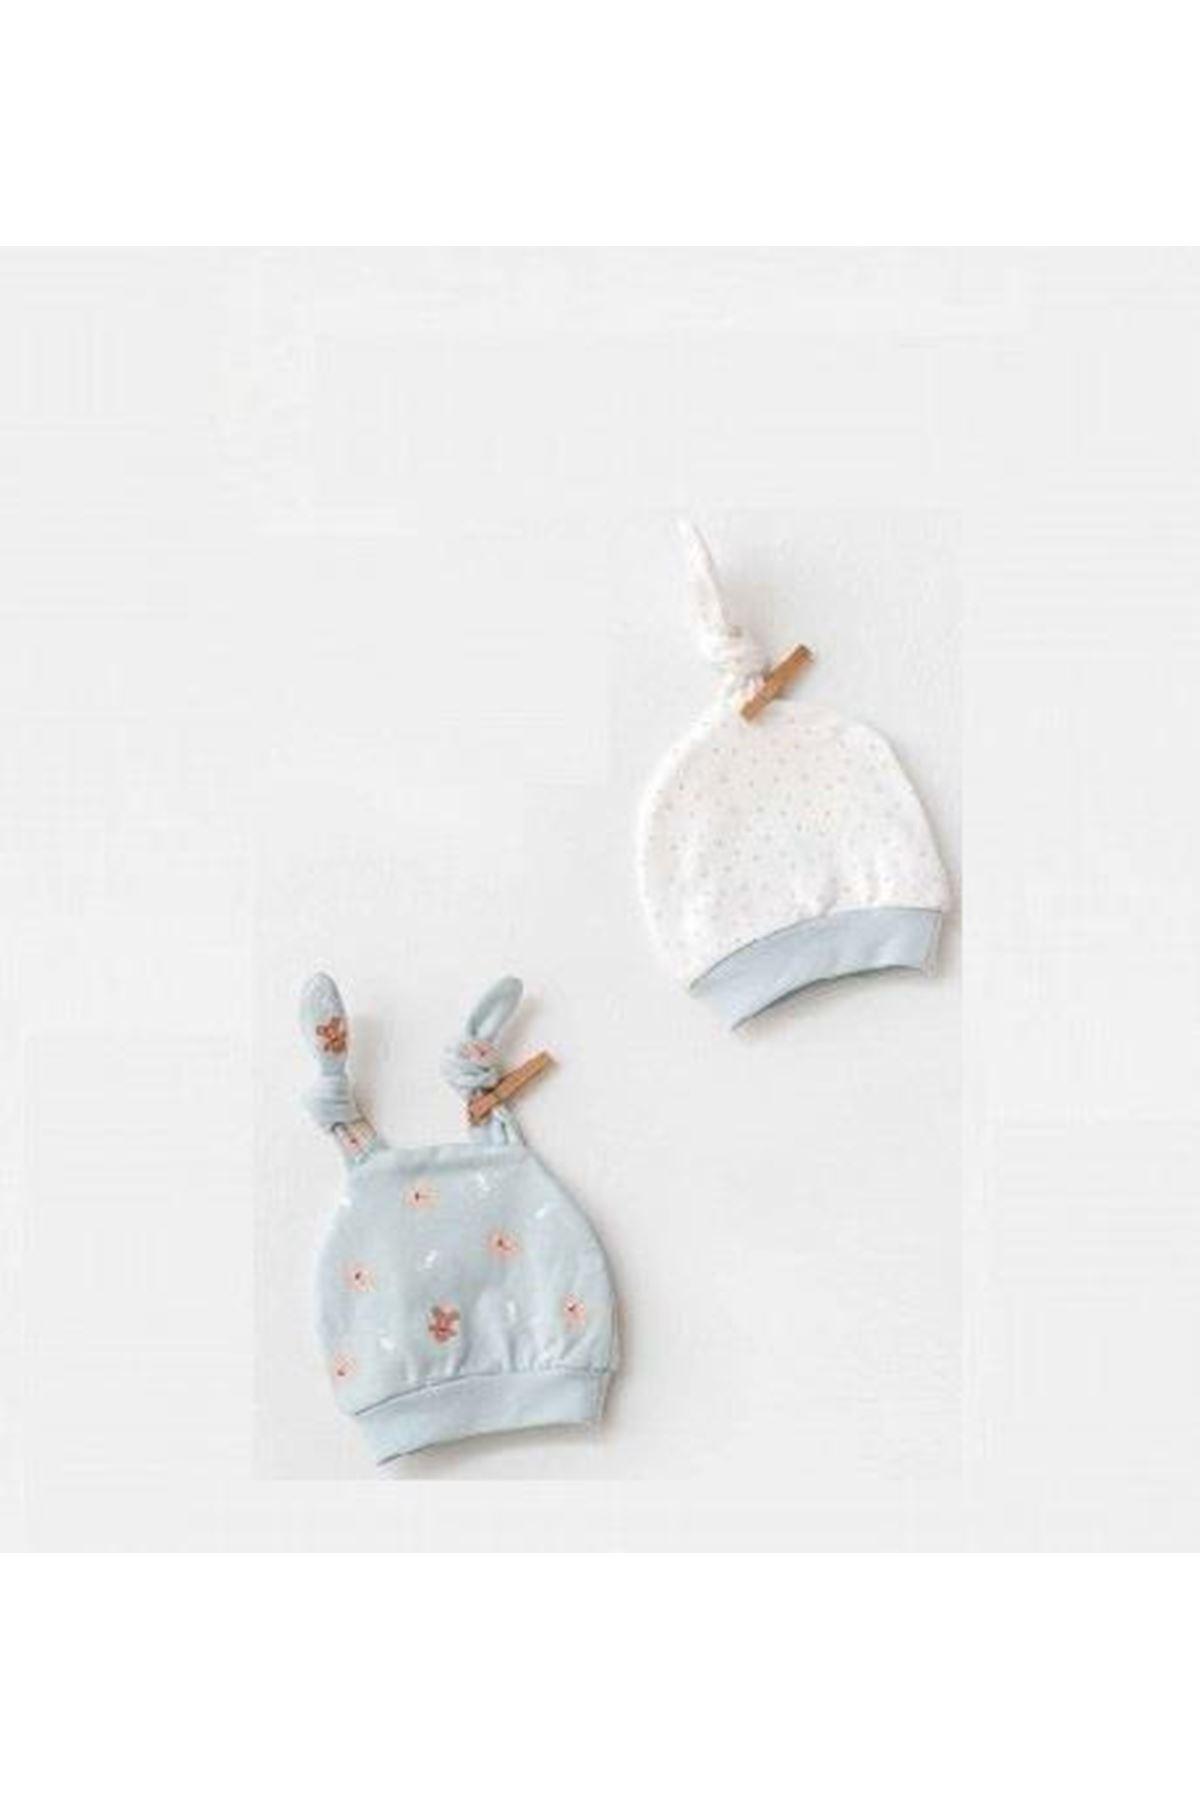 Andywawa AC21310 Natura Wawa Baby 2li Bebek Şapka Mint